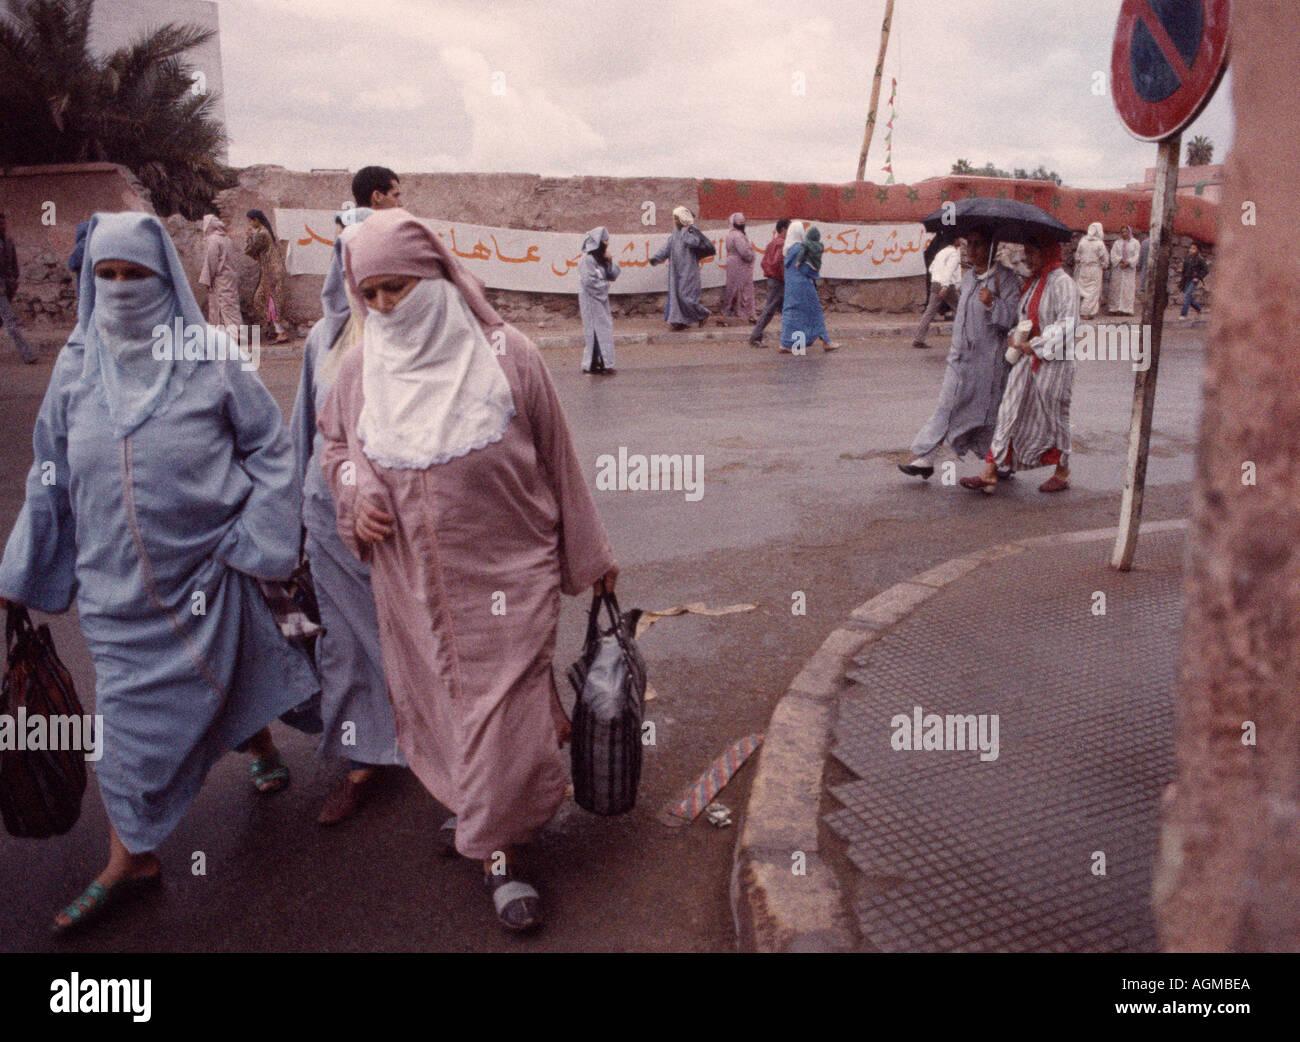 Street scene of yashmak veiled Muslim women in Marrakech Marrakesh in Morocco in the Maghreb in North Africa Sahara. Islamic Islam People Moorish - Stock Image